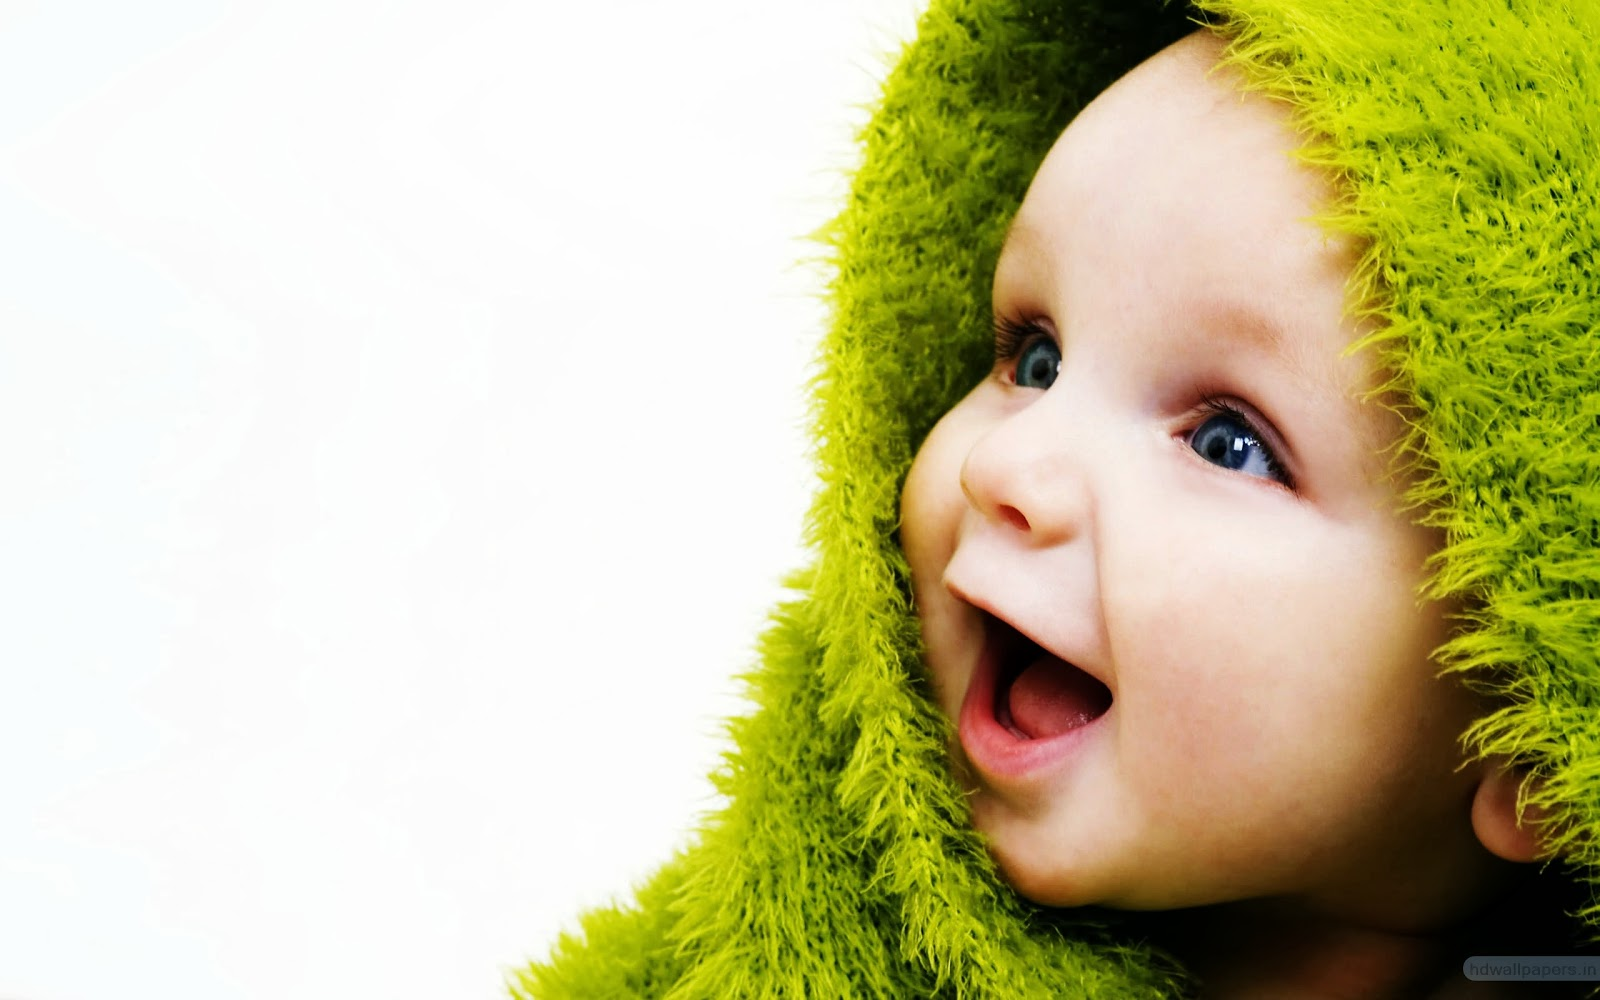 cute baby latest 2014 - wallpaper blog